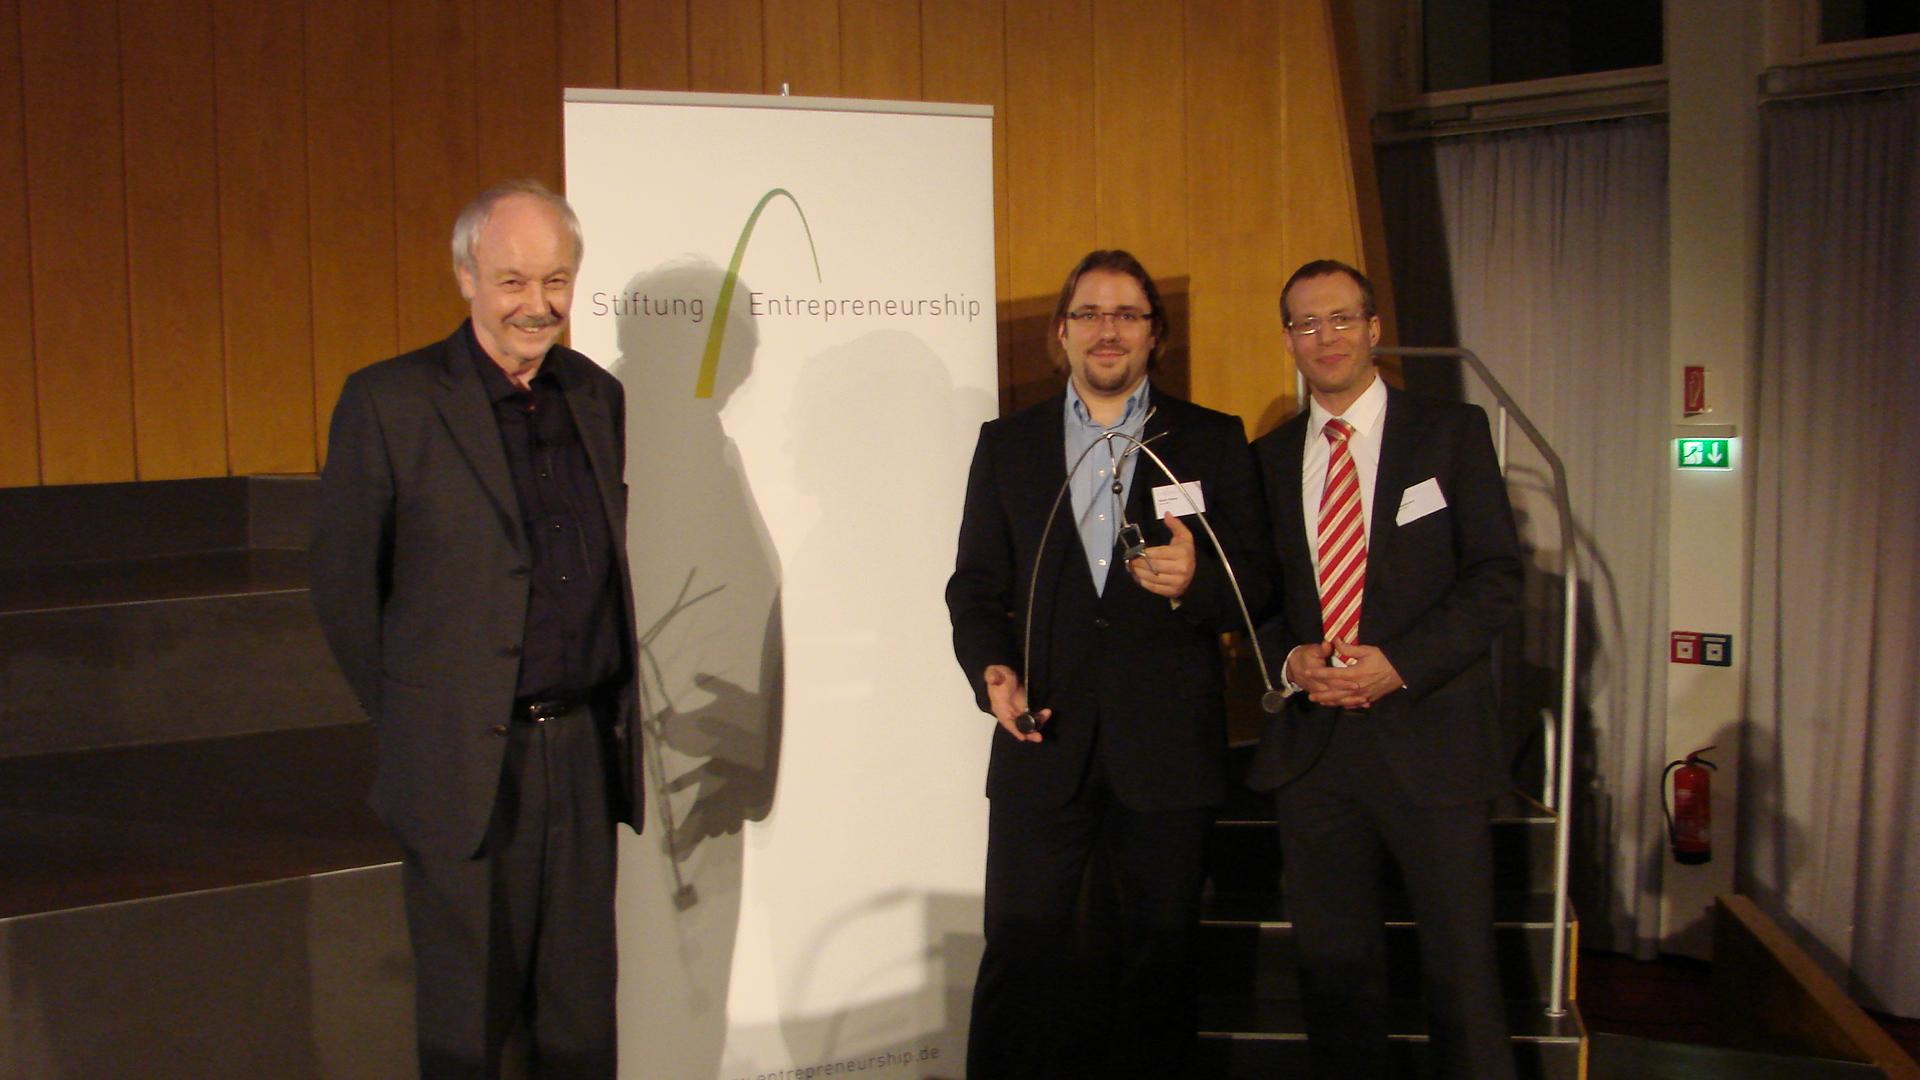 DSC08837 Verleihung des Kopf schlägt Kapital Gründerpreises